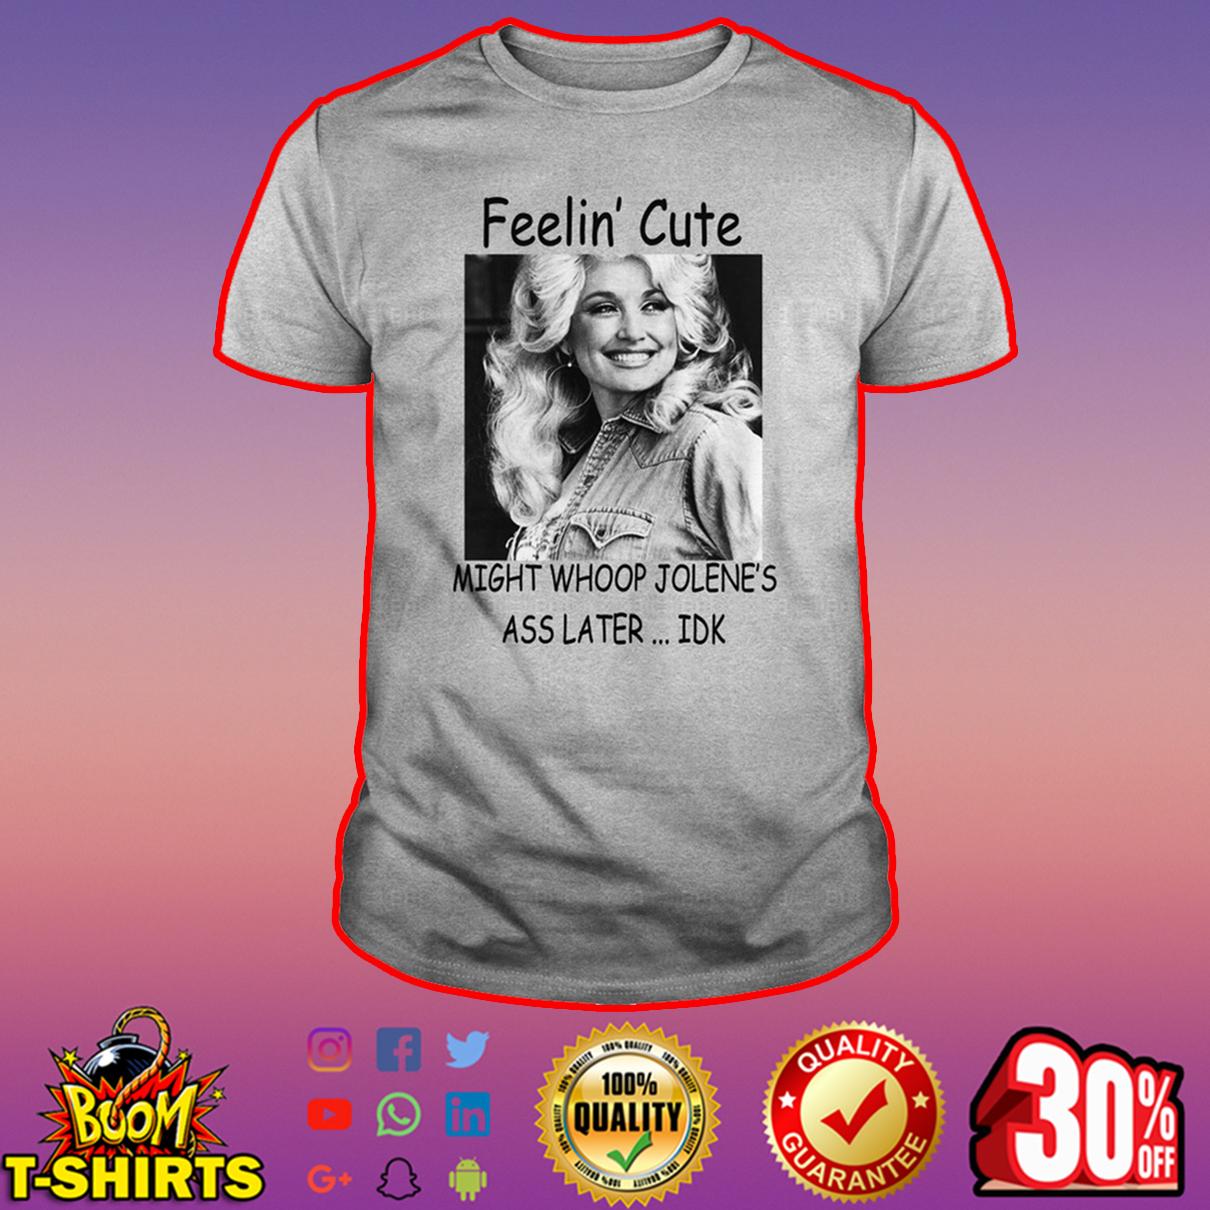 Dolly Parton Feelin' cute might whoop jolene's ass later IDK shirt